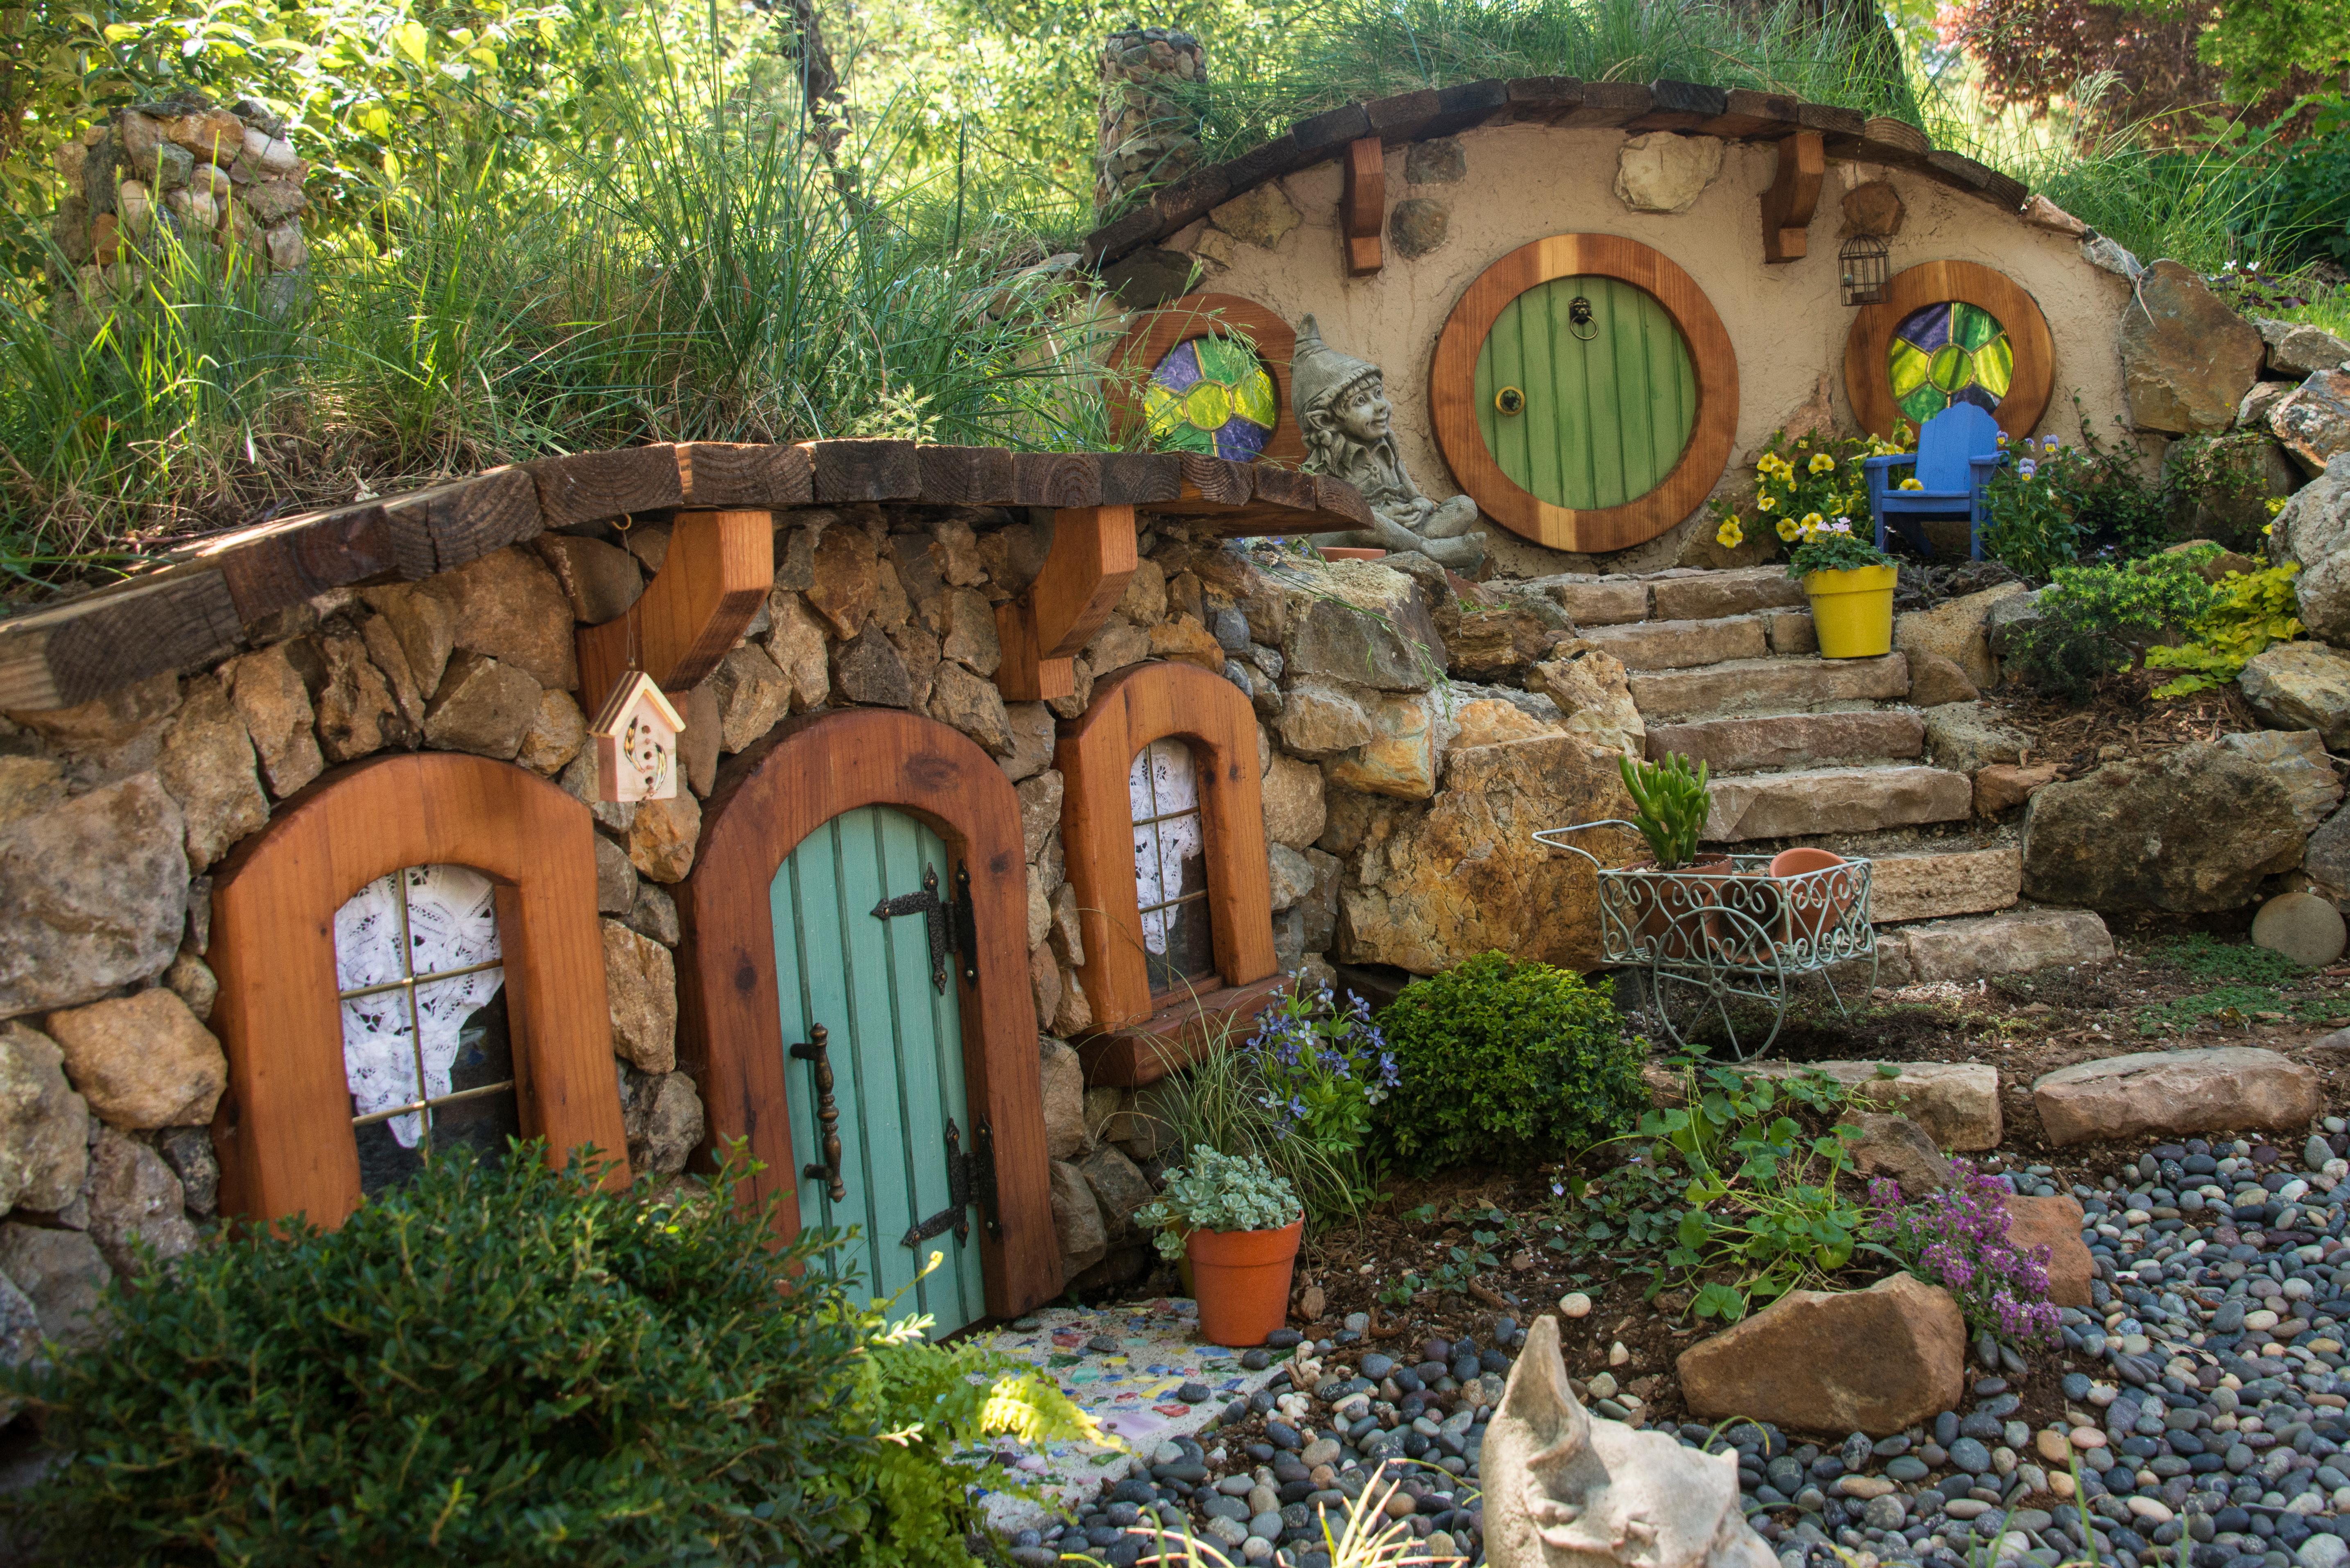 Jardin des Hobbits Garden-tour-spring-2013-50